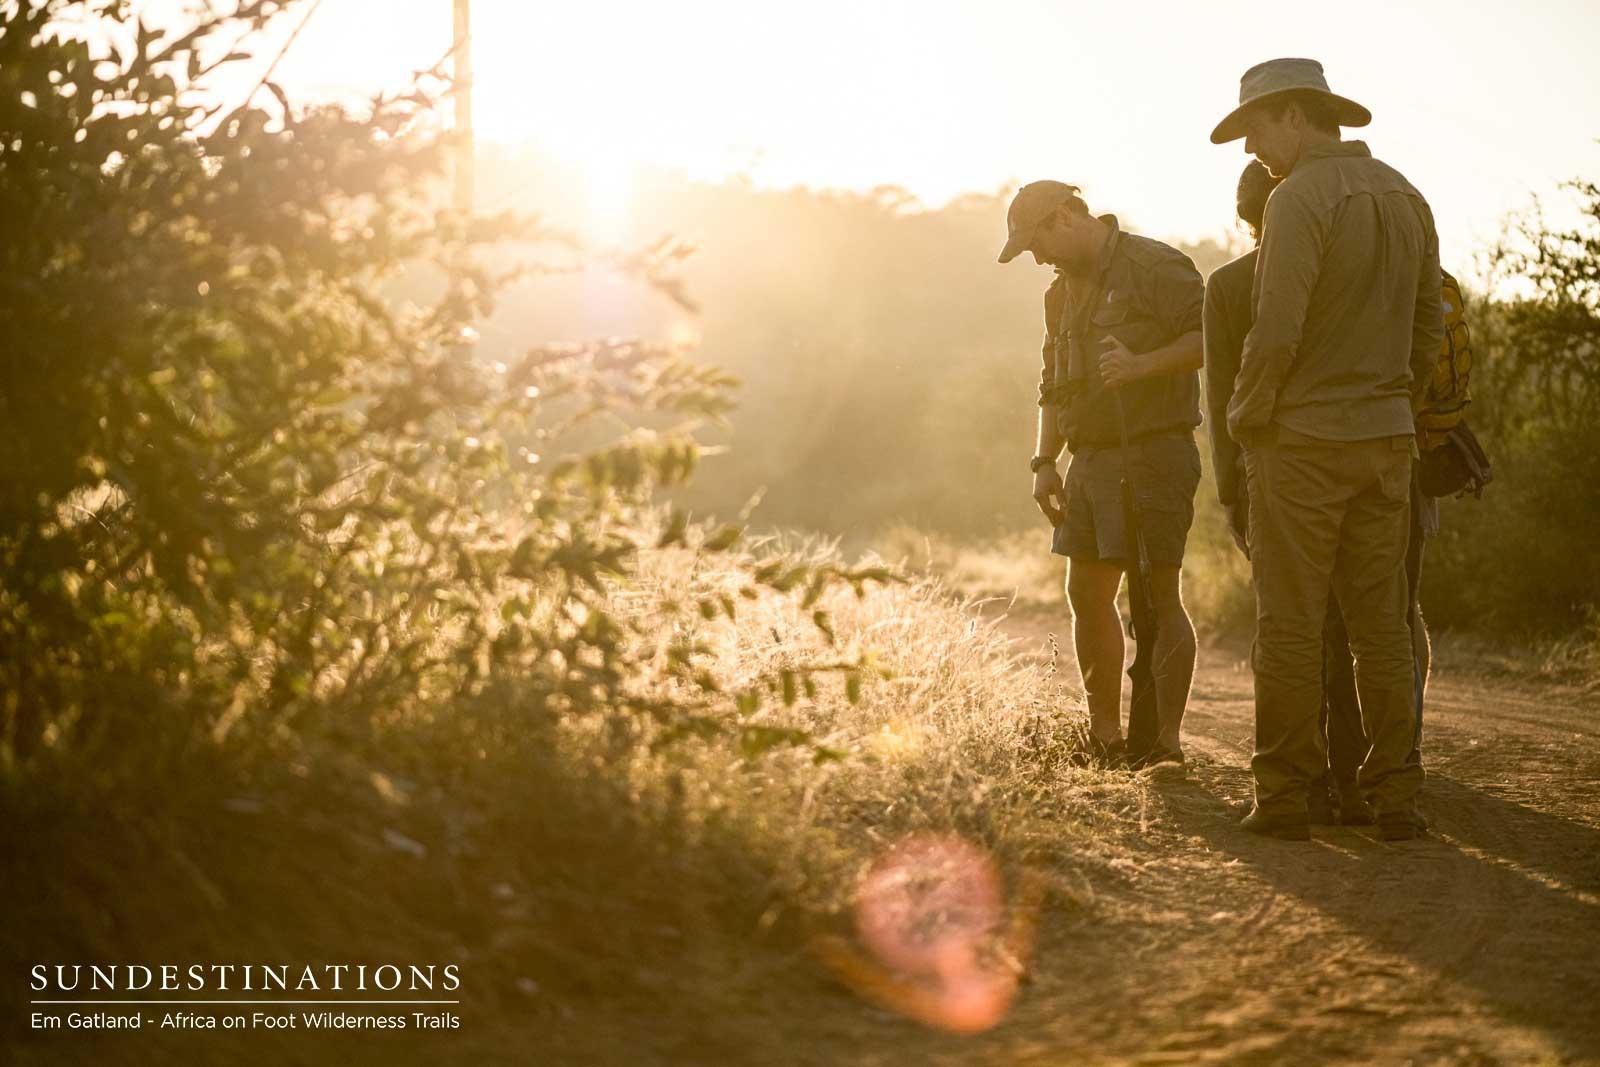 Africa on Foot Wilderness Trails